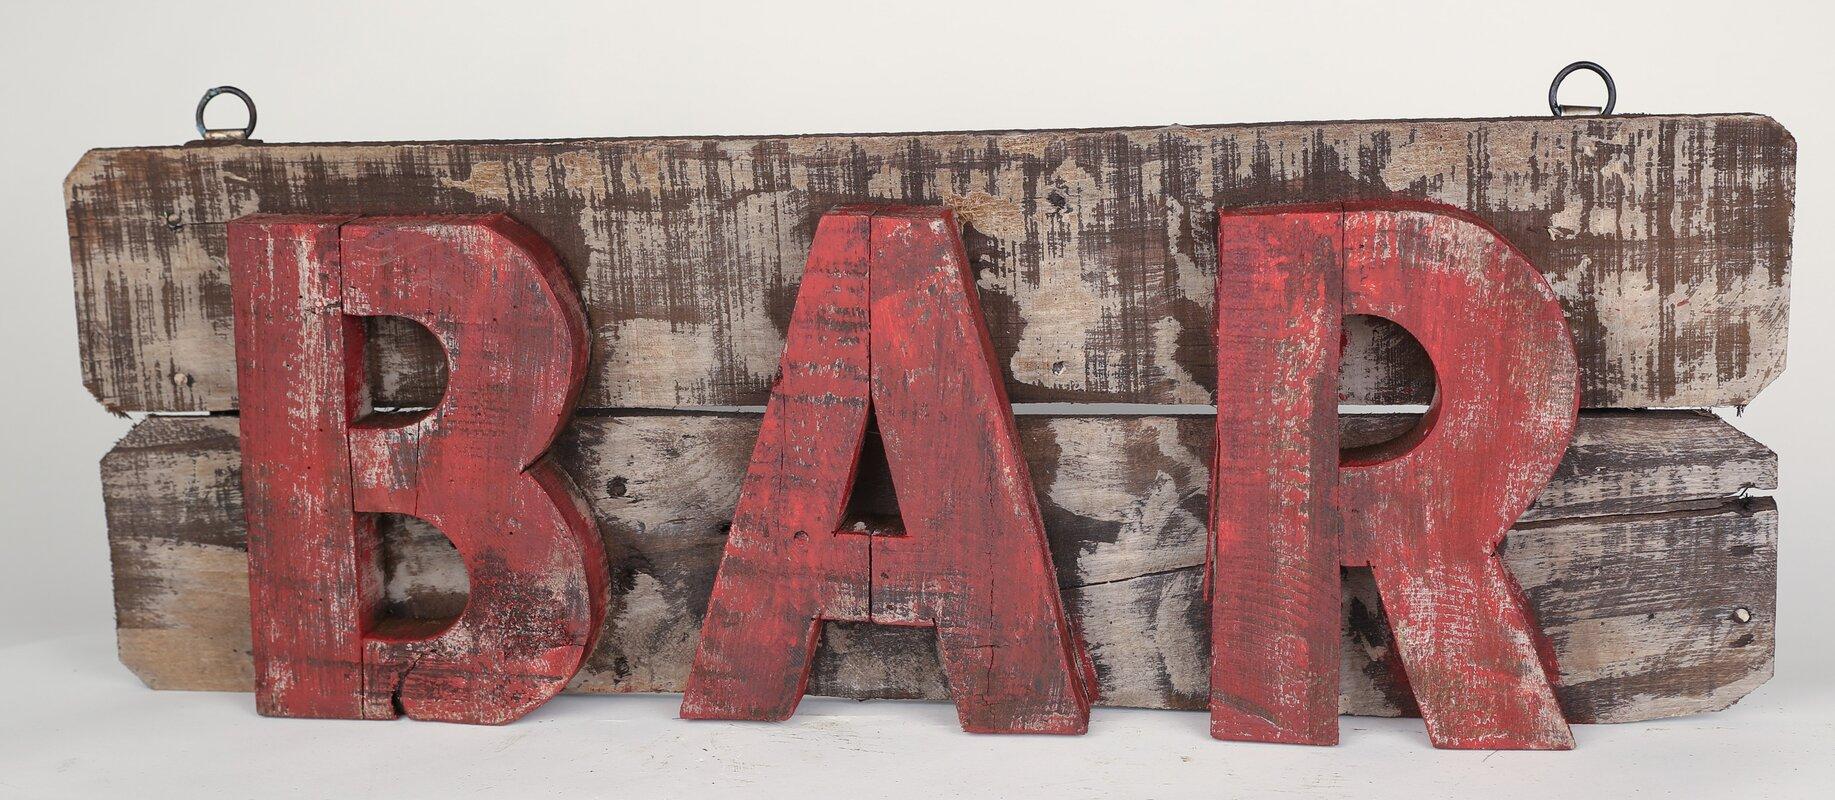 MyAmigosImports Rustic Wooden Bar Sign Wall Decor & Reviews | Wayfair